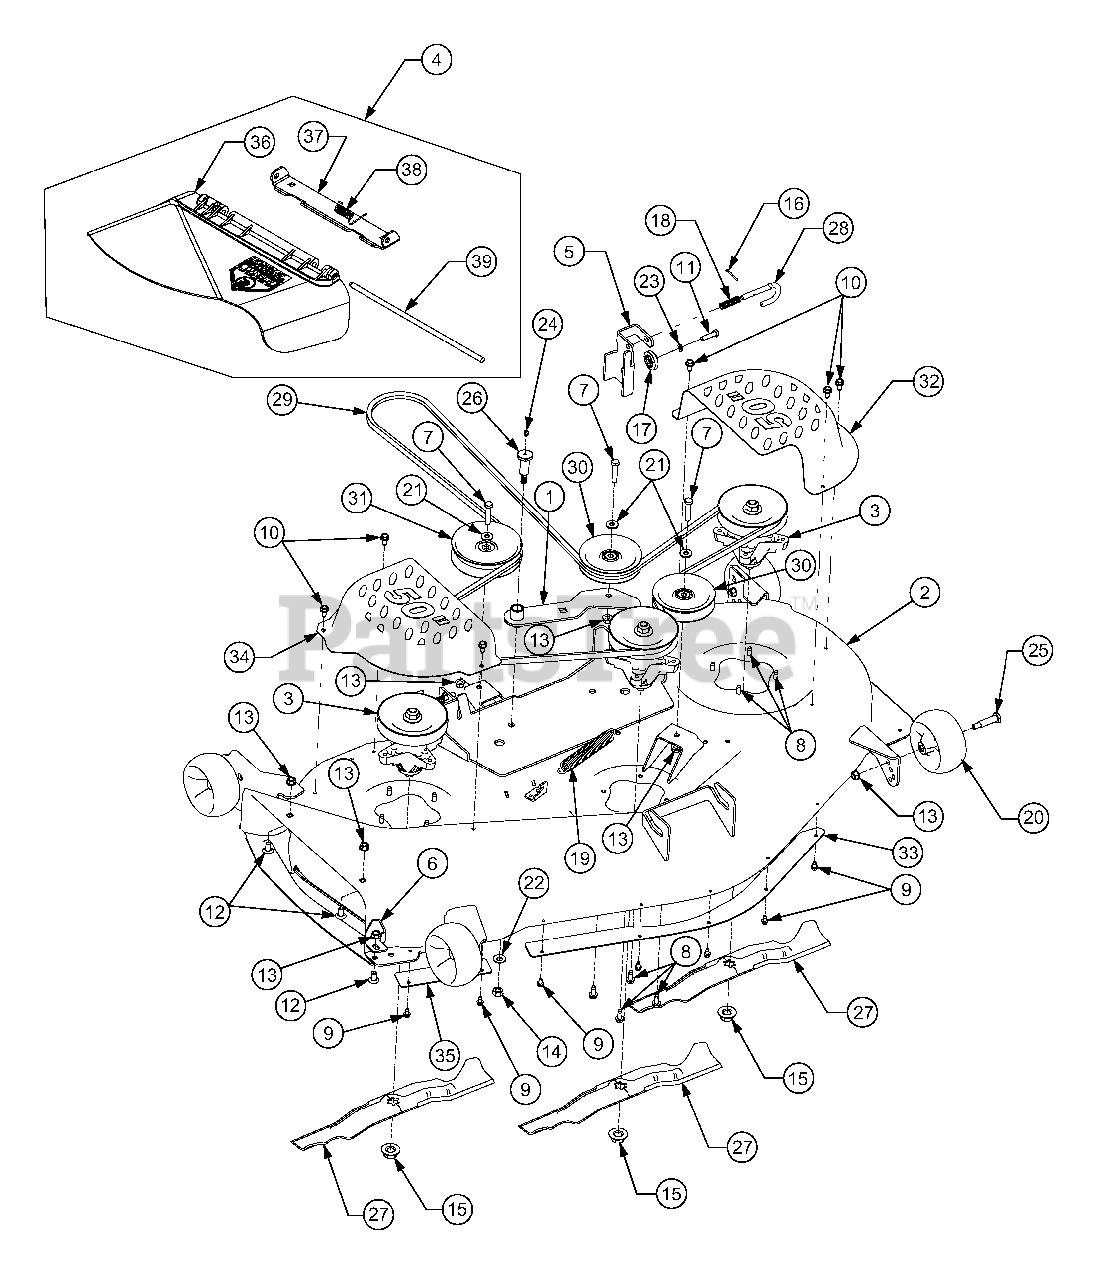 [DIAGRAM] Cub Cadet Zero Turn Rzt 22 Wiring Diagram FULL